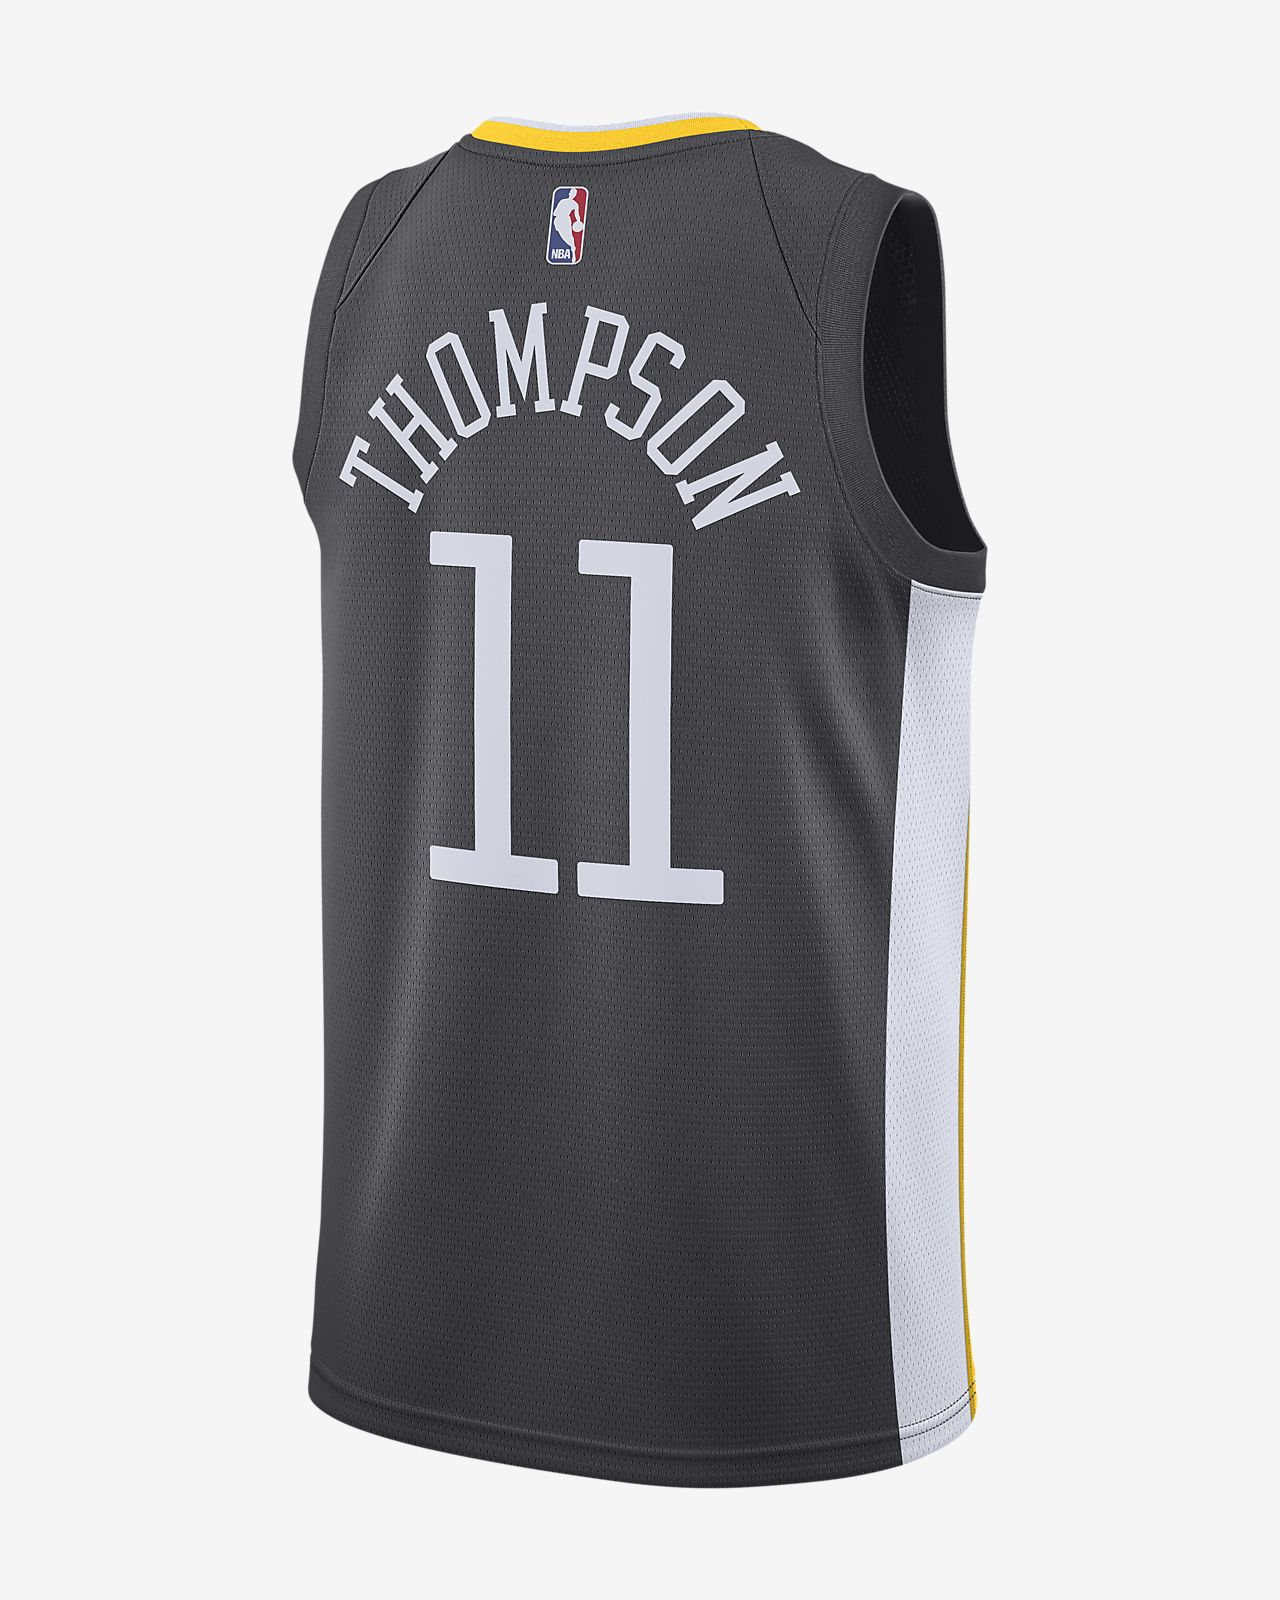 e71e5881662 ... Klay Thompson Statement Edition Swingman (Golden State Warriors) Men s  Nike NBA Connected Jersey